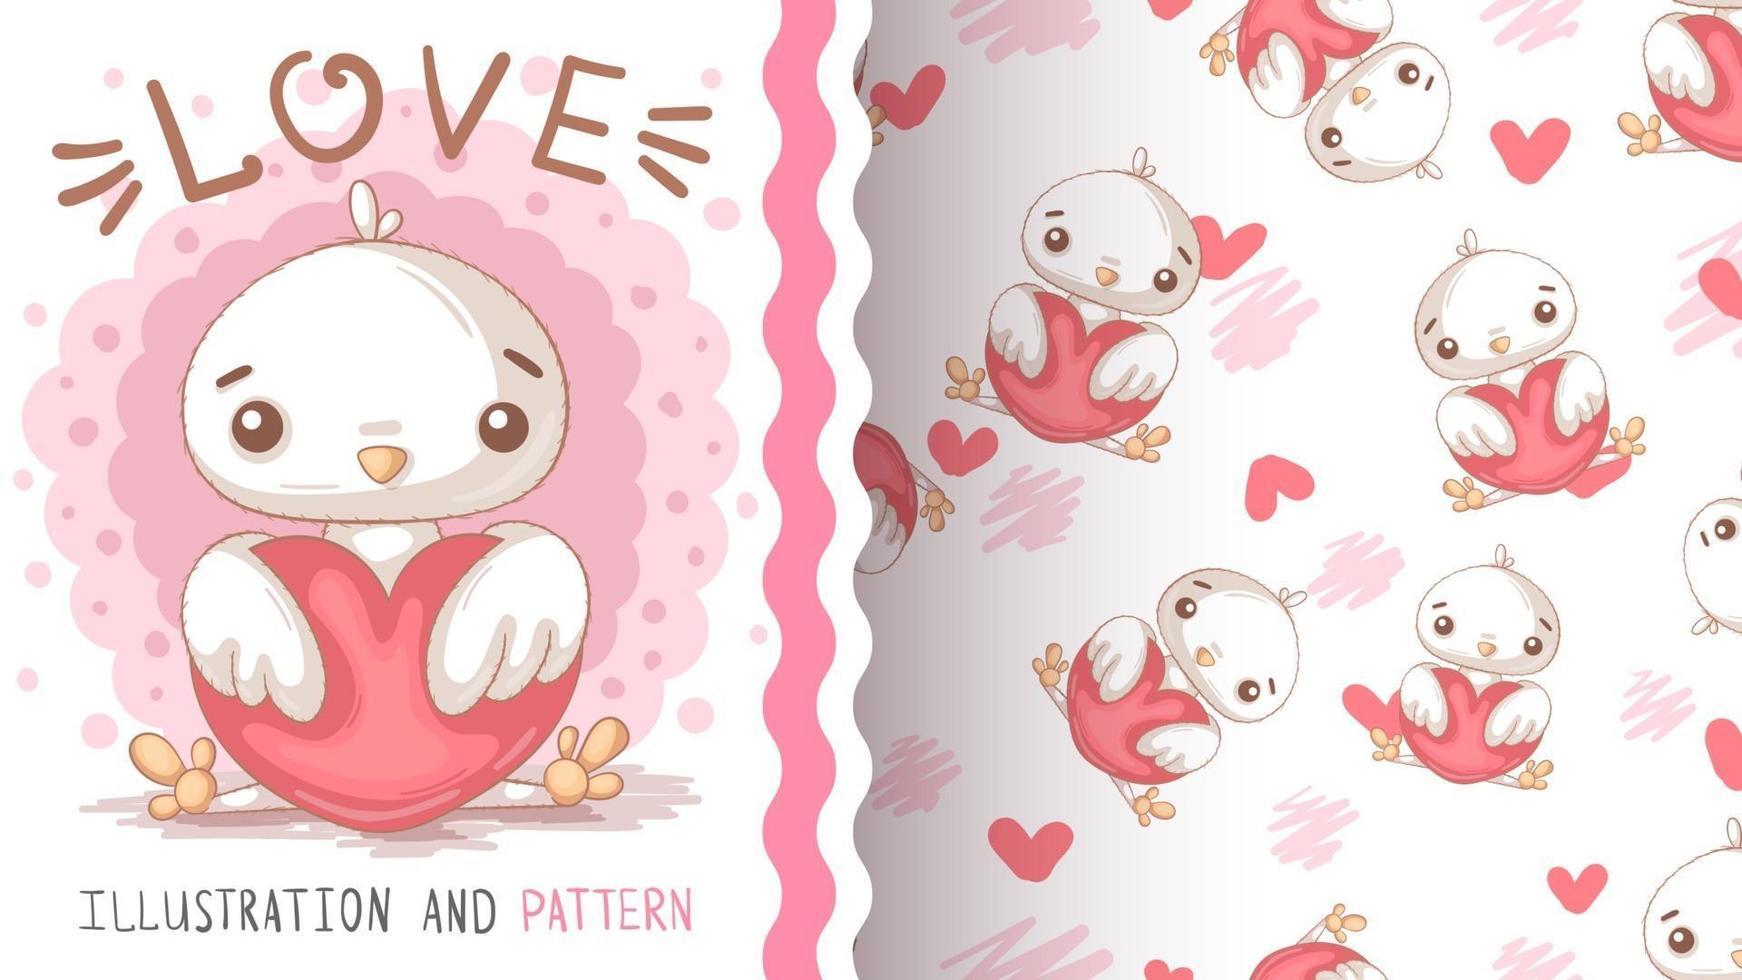 Childish cartoon character animal bird chick with heart vector